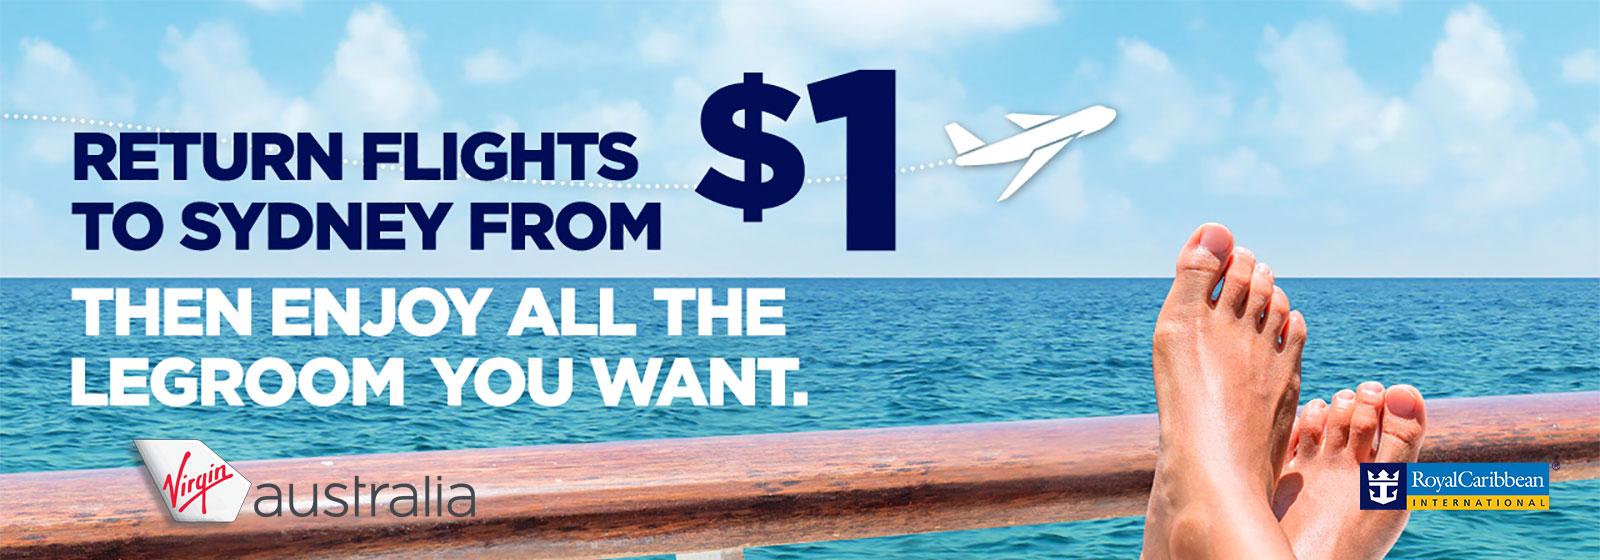 Royal Caribbean Domestic Air Offer